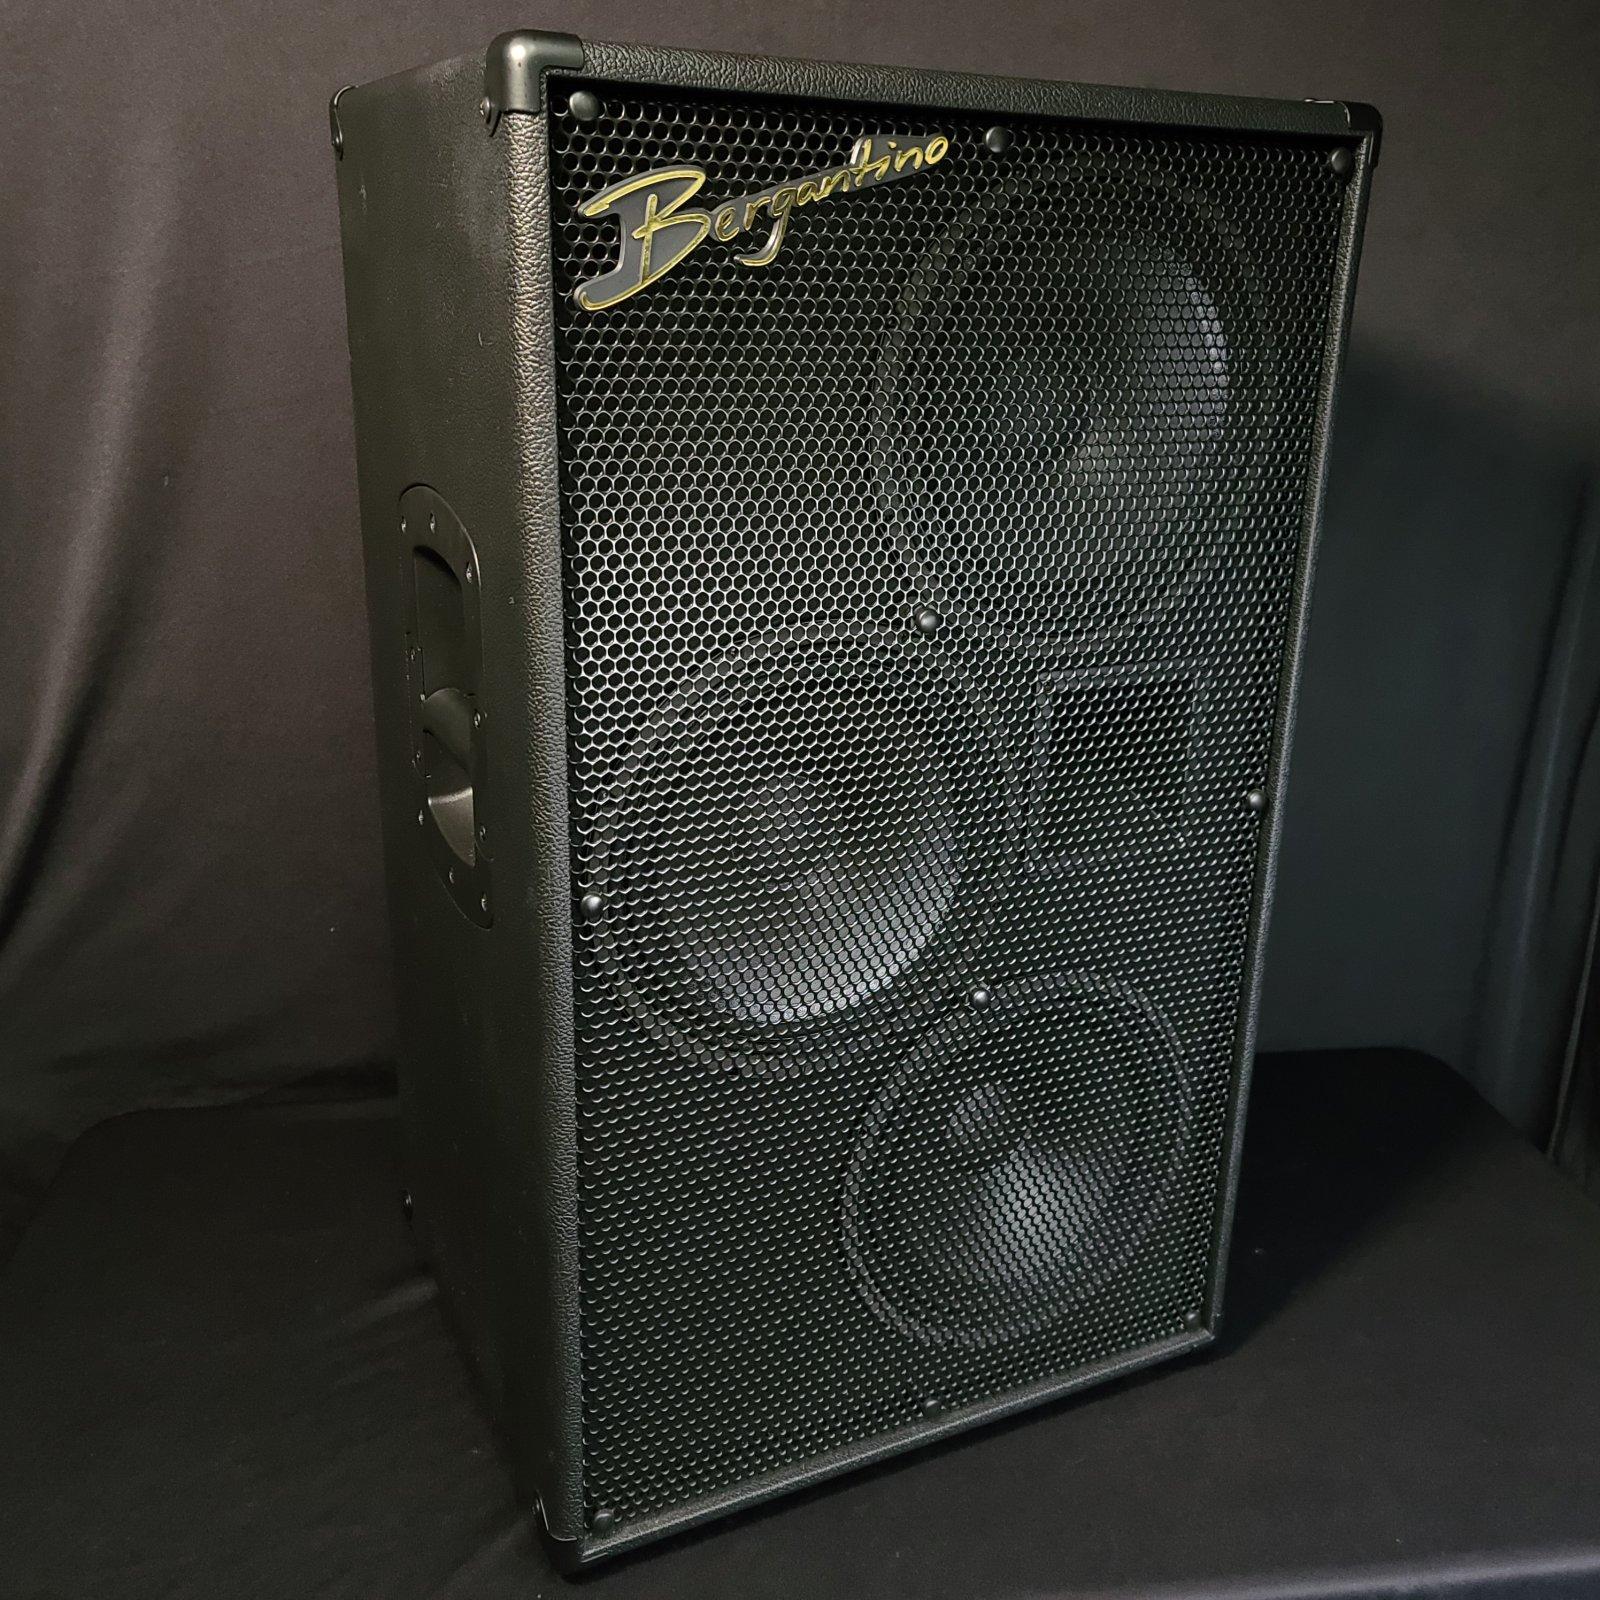 Bergantino Demo HG410 Bass Cabinet +/-47 pounds. 1 speaker in rear